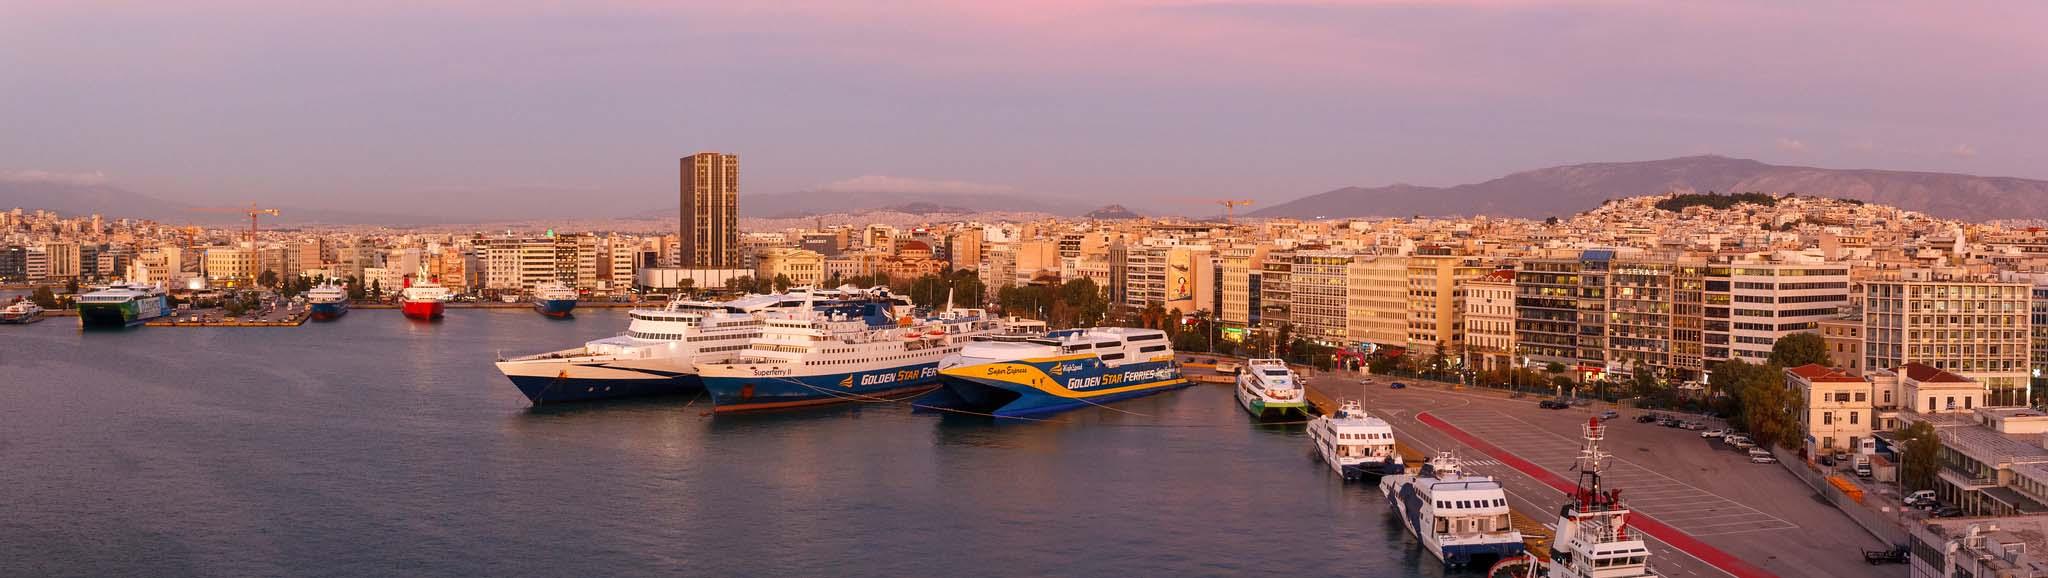 Пирейский порт в Афинах